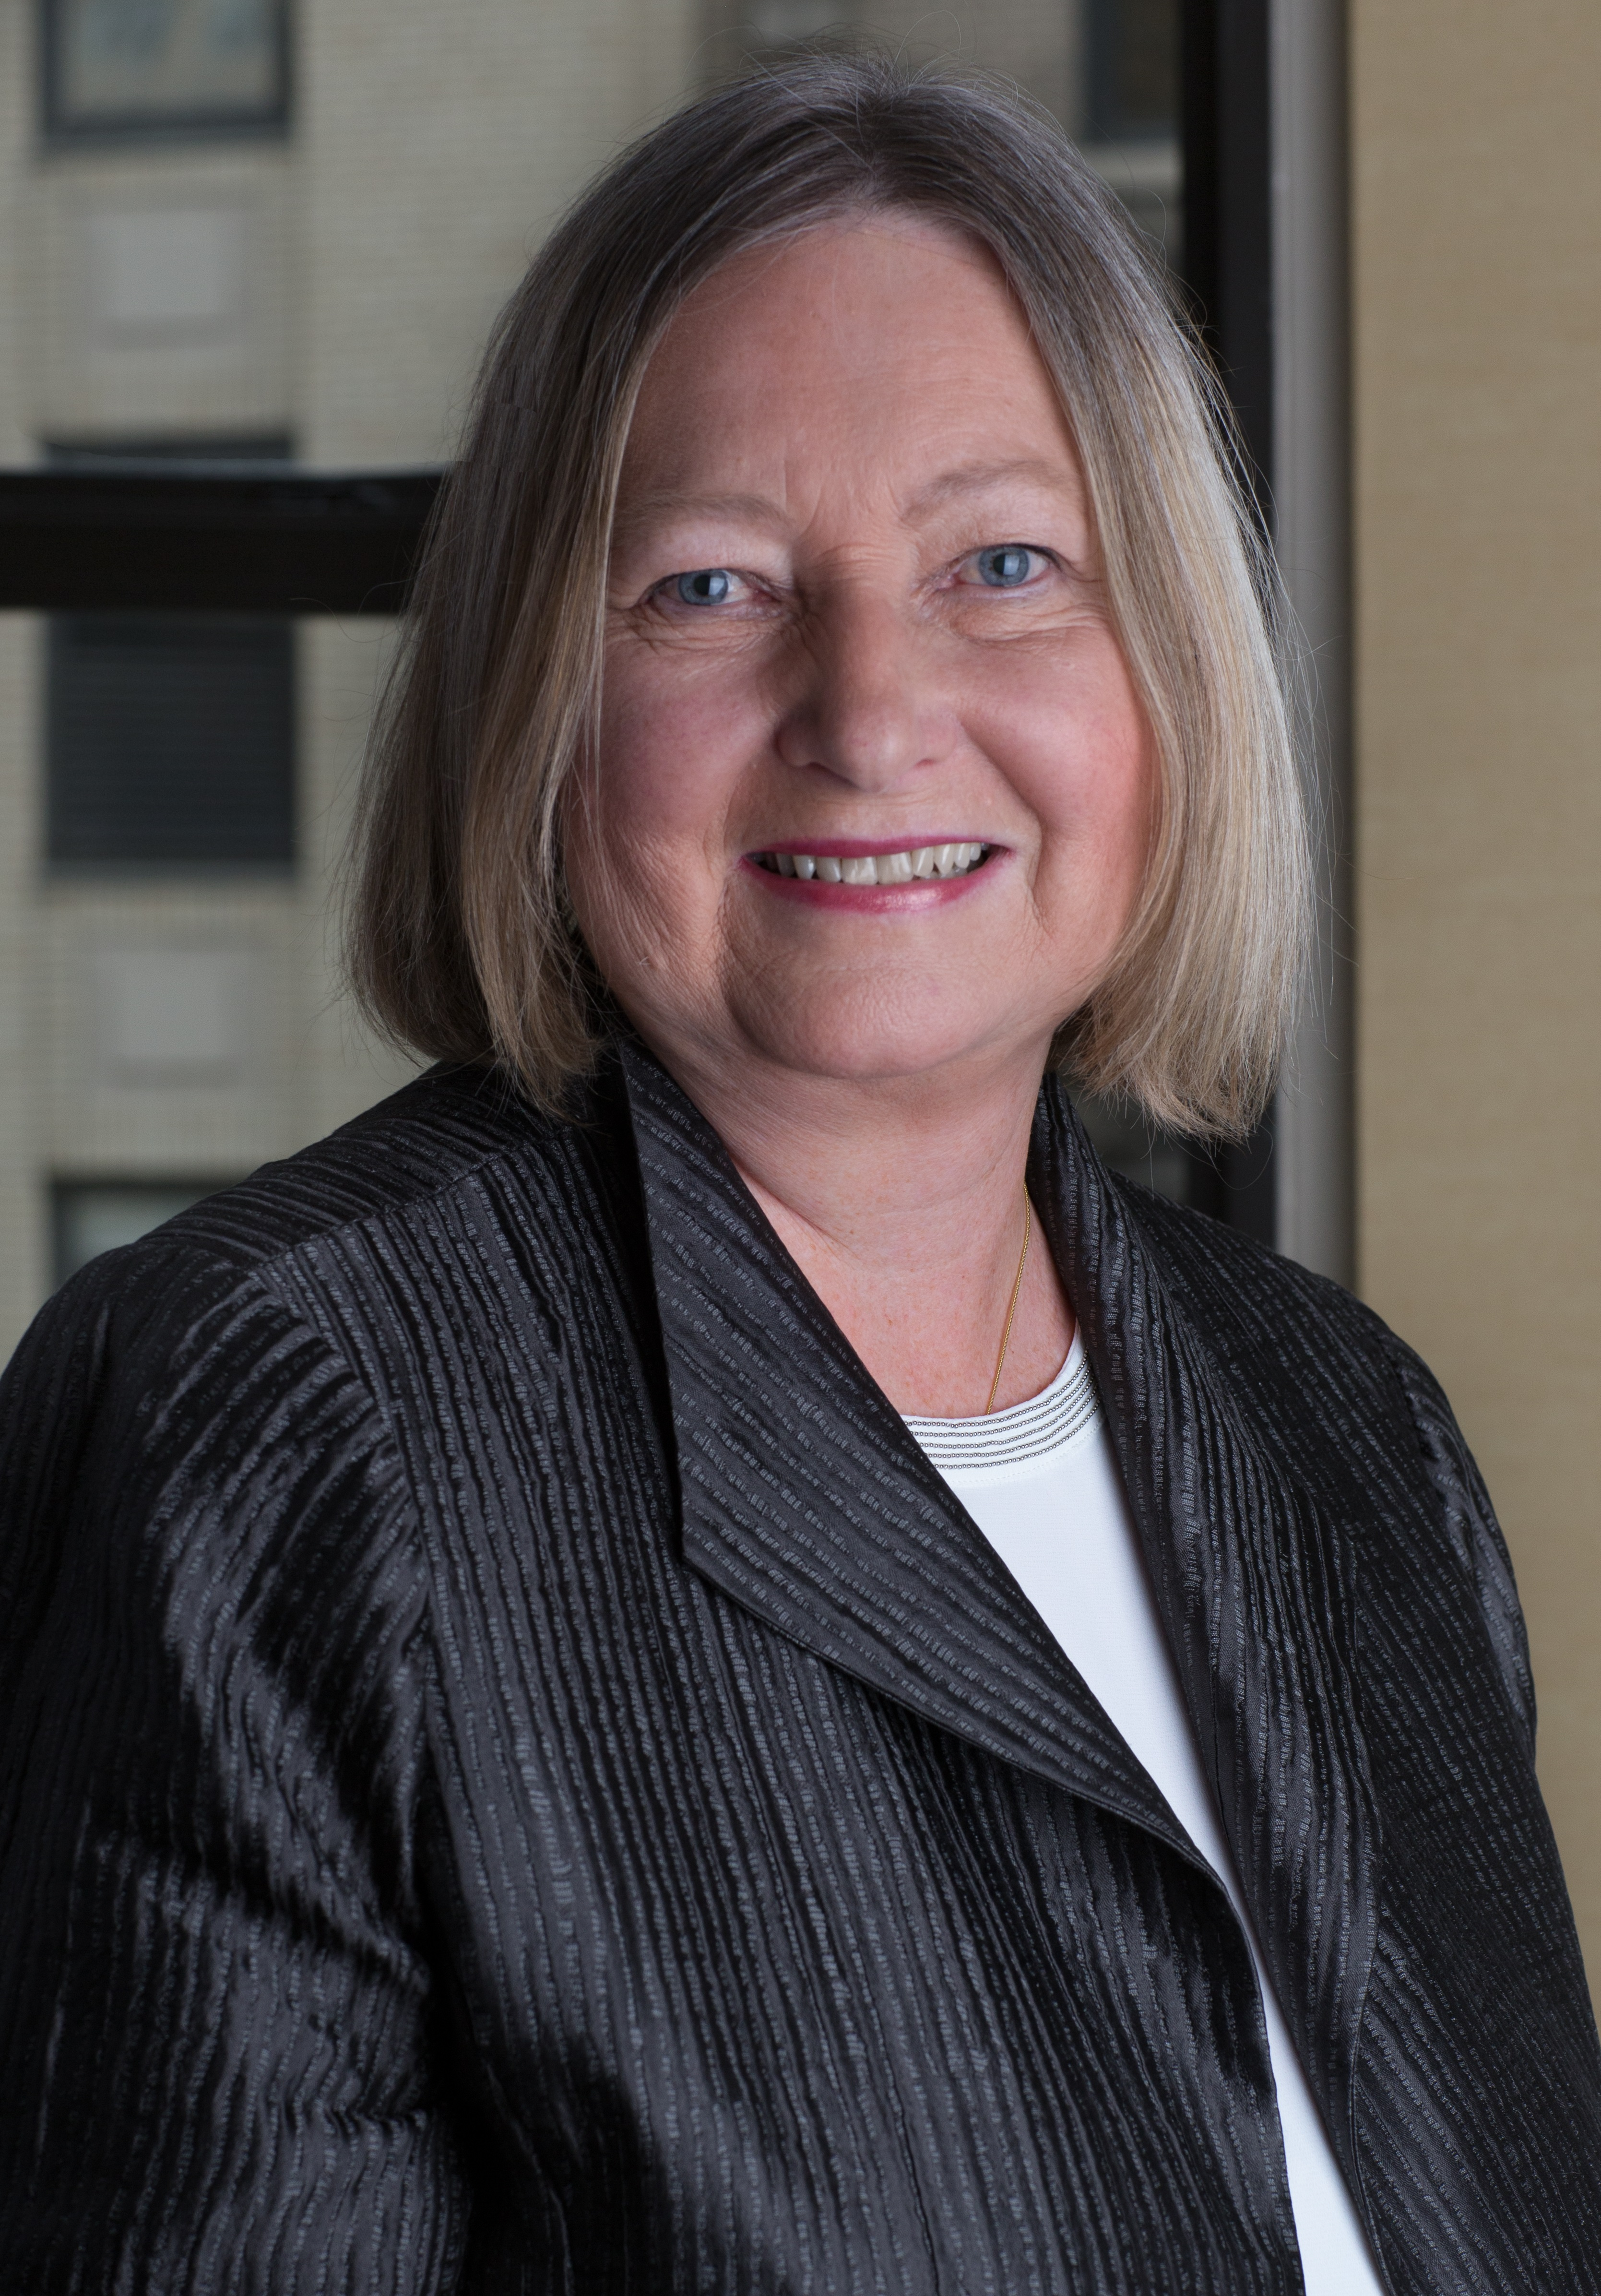 MonikaConley